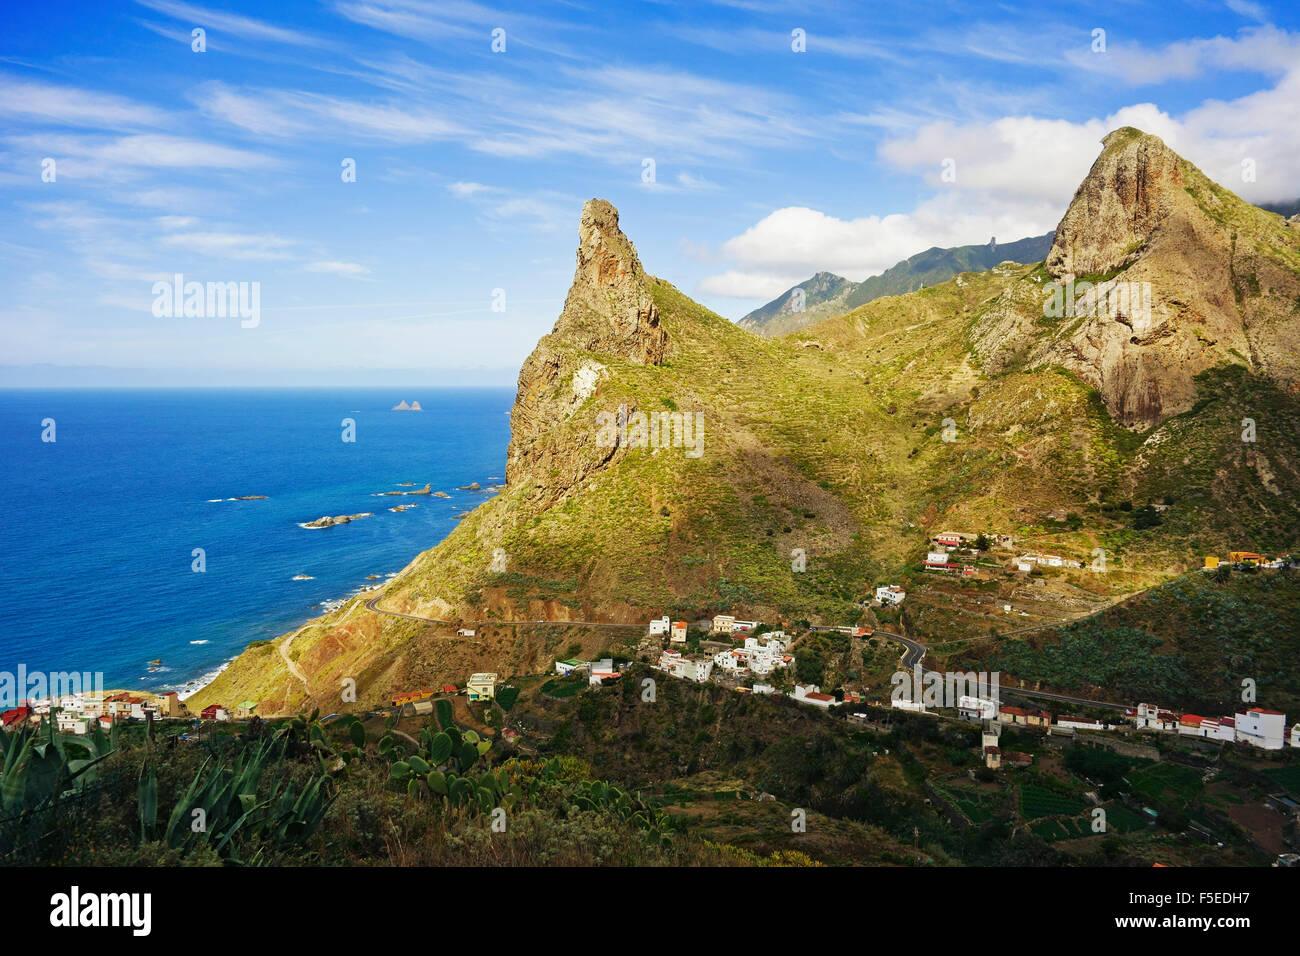 Taganana village, Anaga Mountains, Tenerife, Canary Islands, Spain, Atlantic, Europe - Stock Image